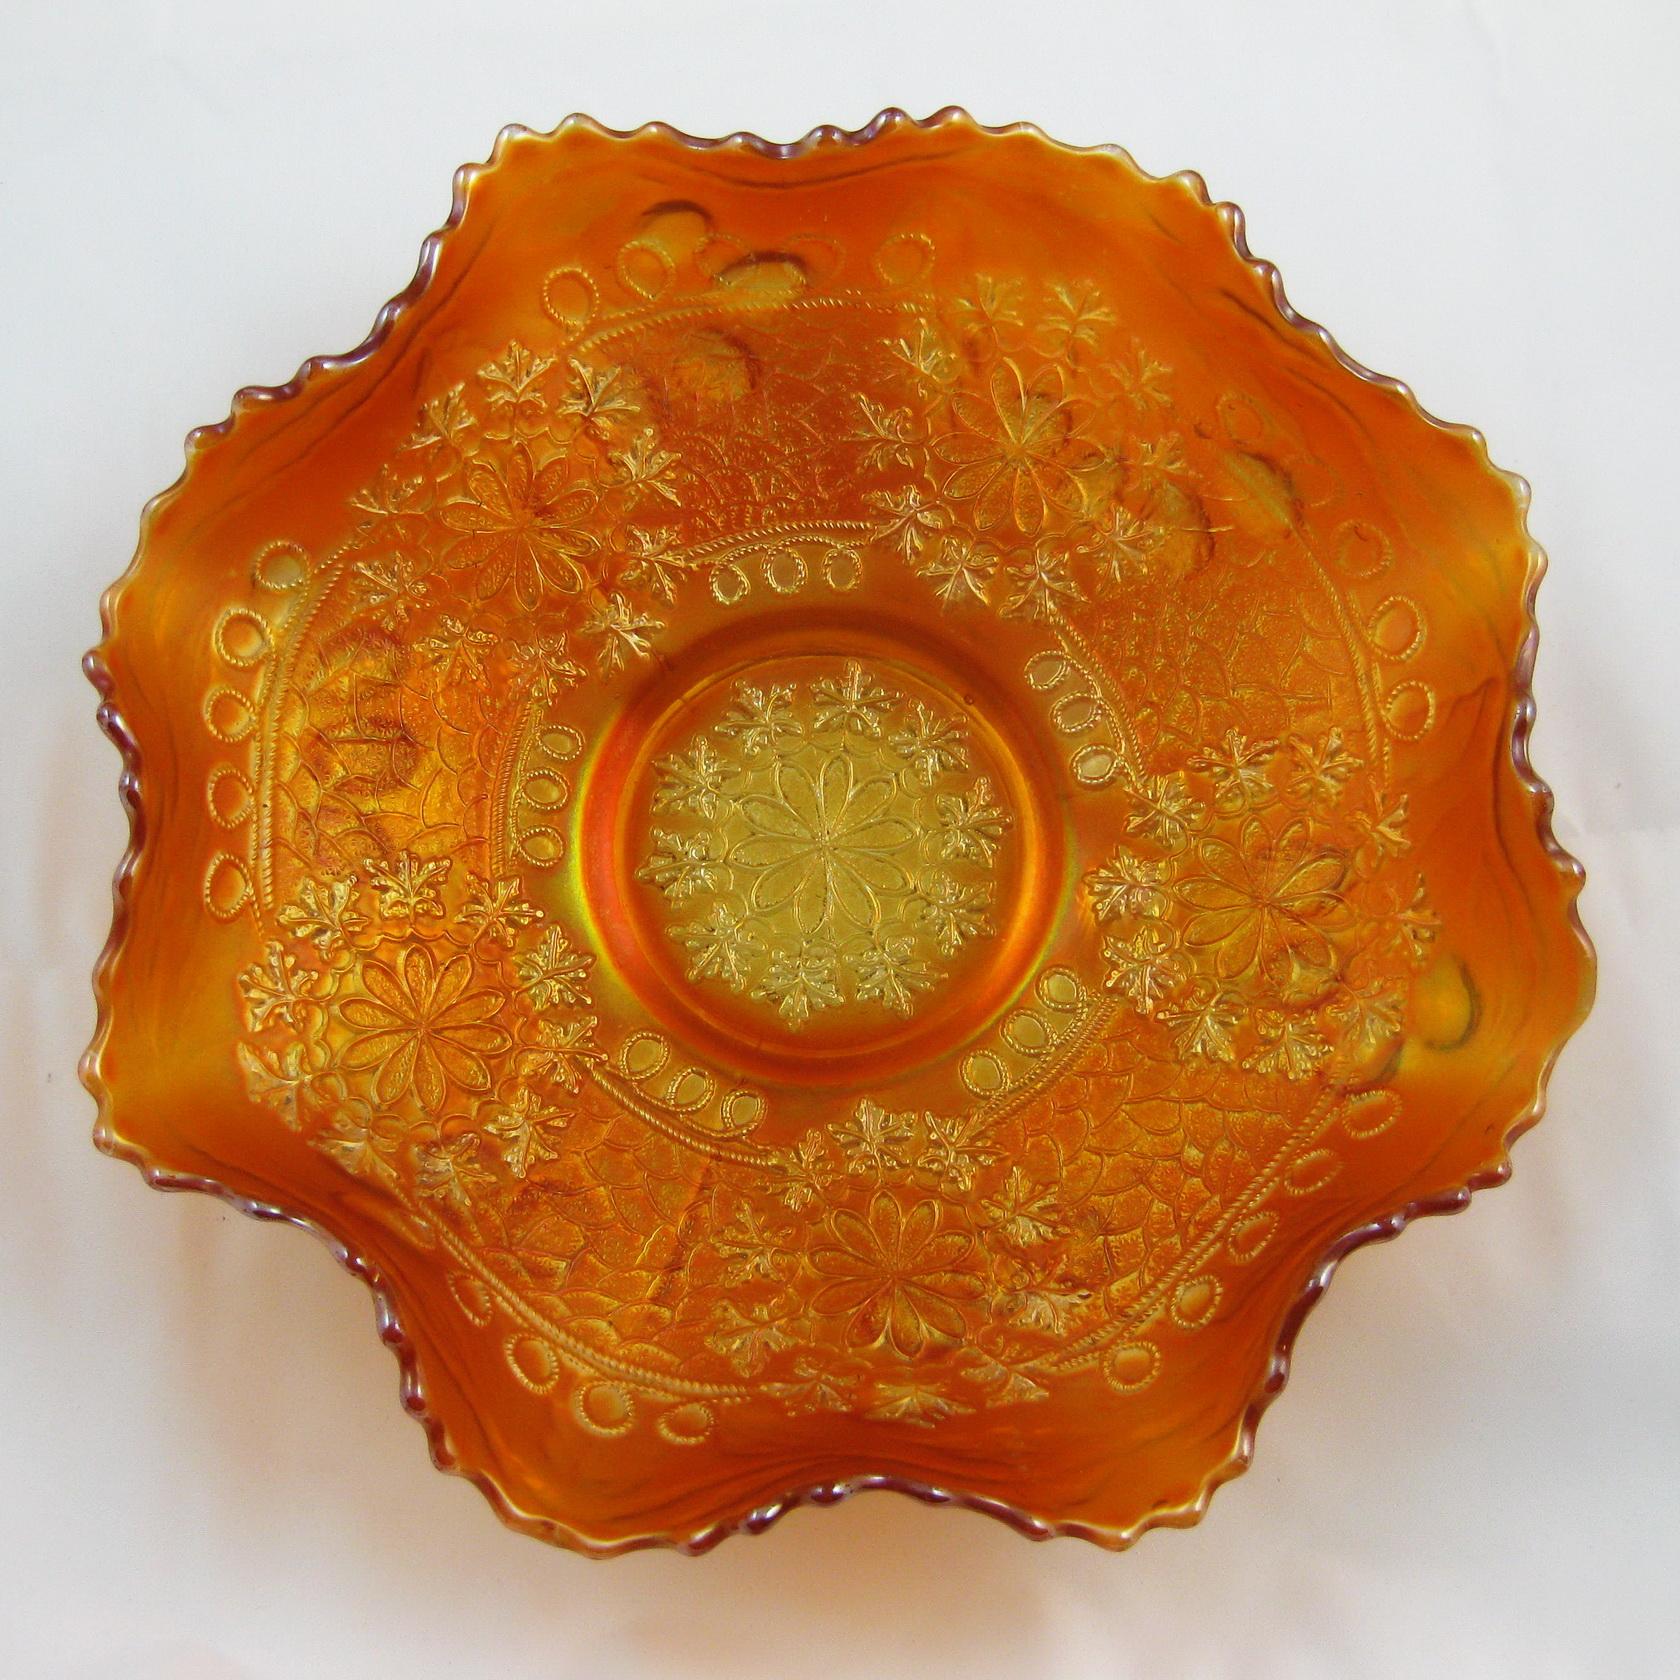 Antique Fenton Marigold Leaf Chain Carnival Glass Ruffled